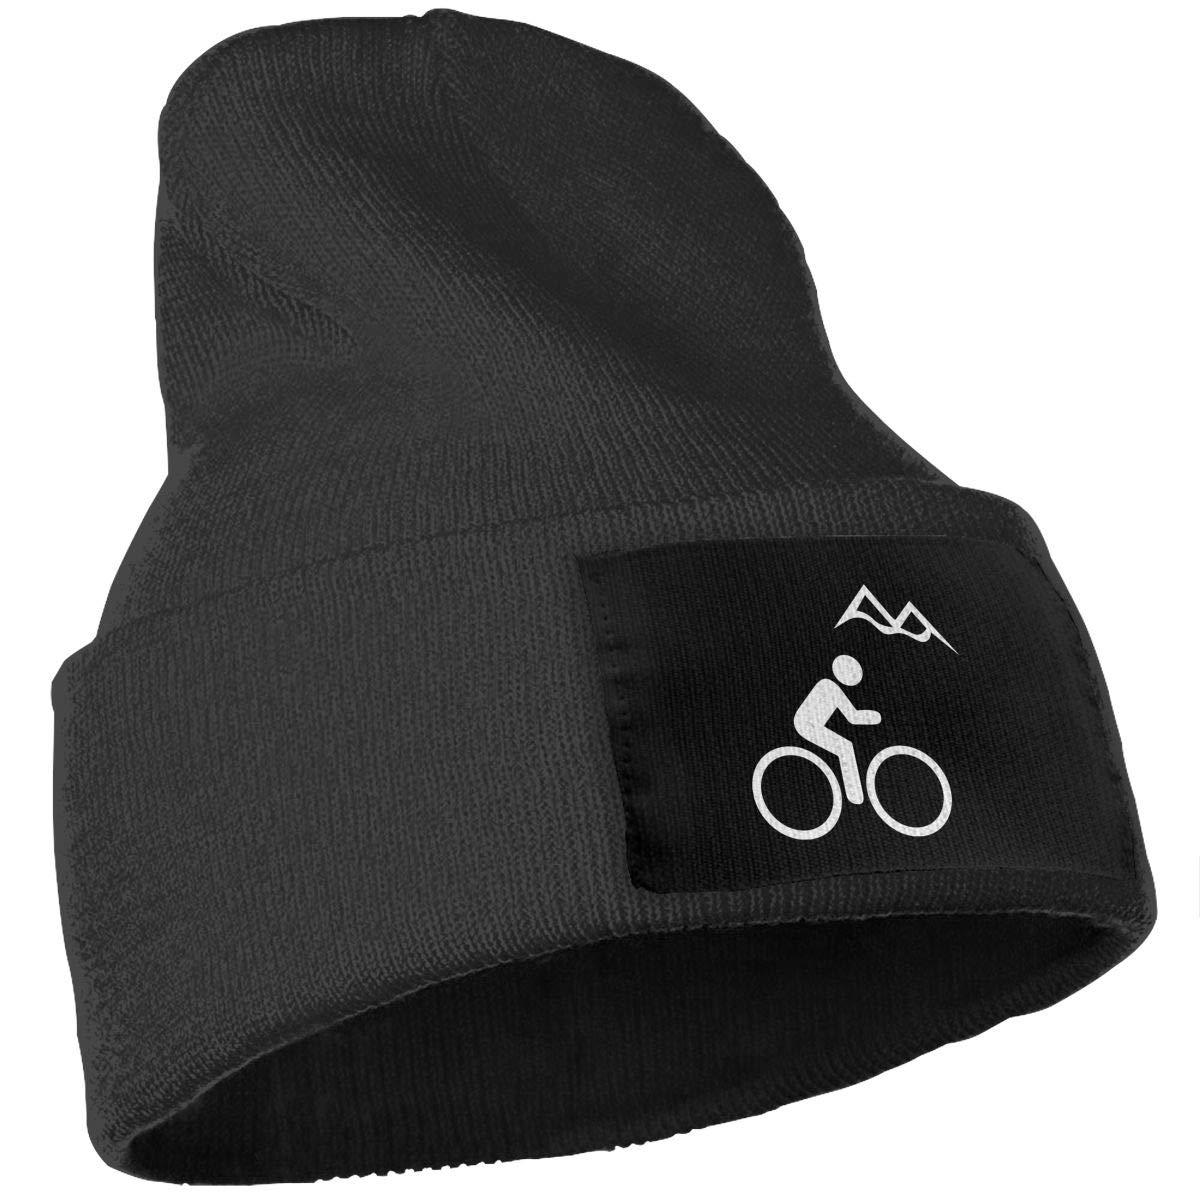 COLLJL-8 Men /& Women Mountain Bike Outdoor Fashion Knit Beanies Hat Soft Winter Skull Caps